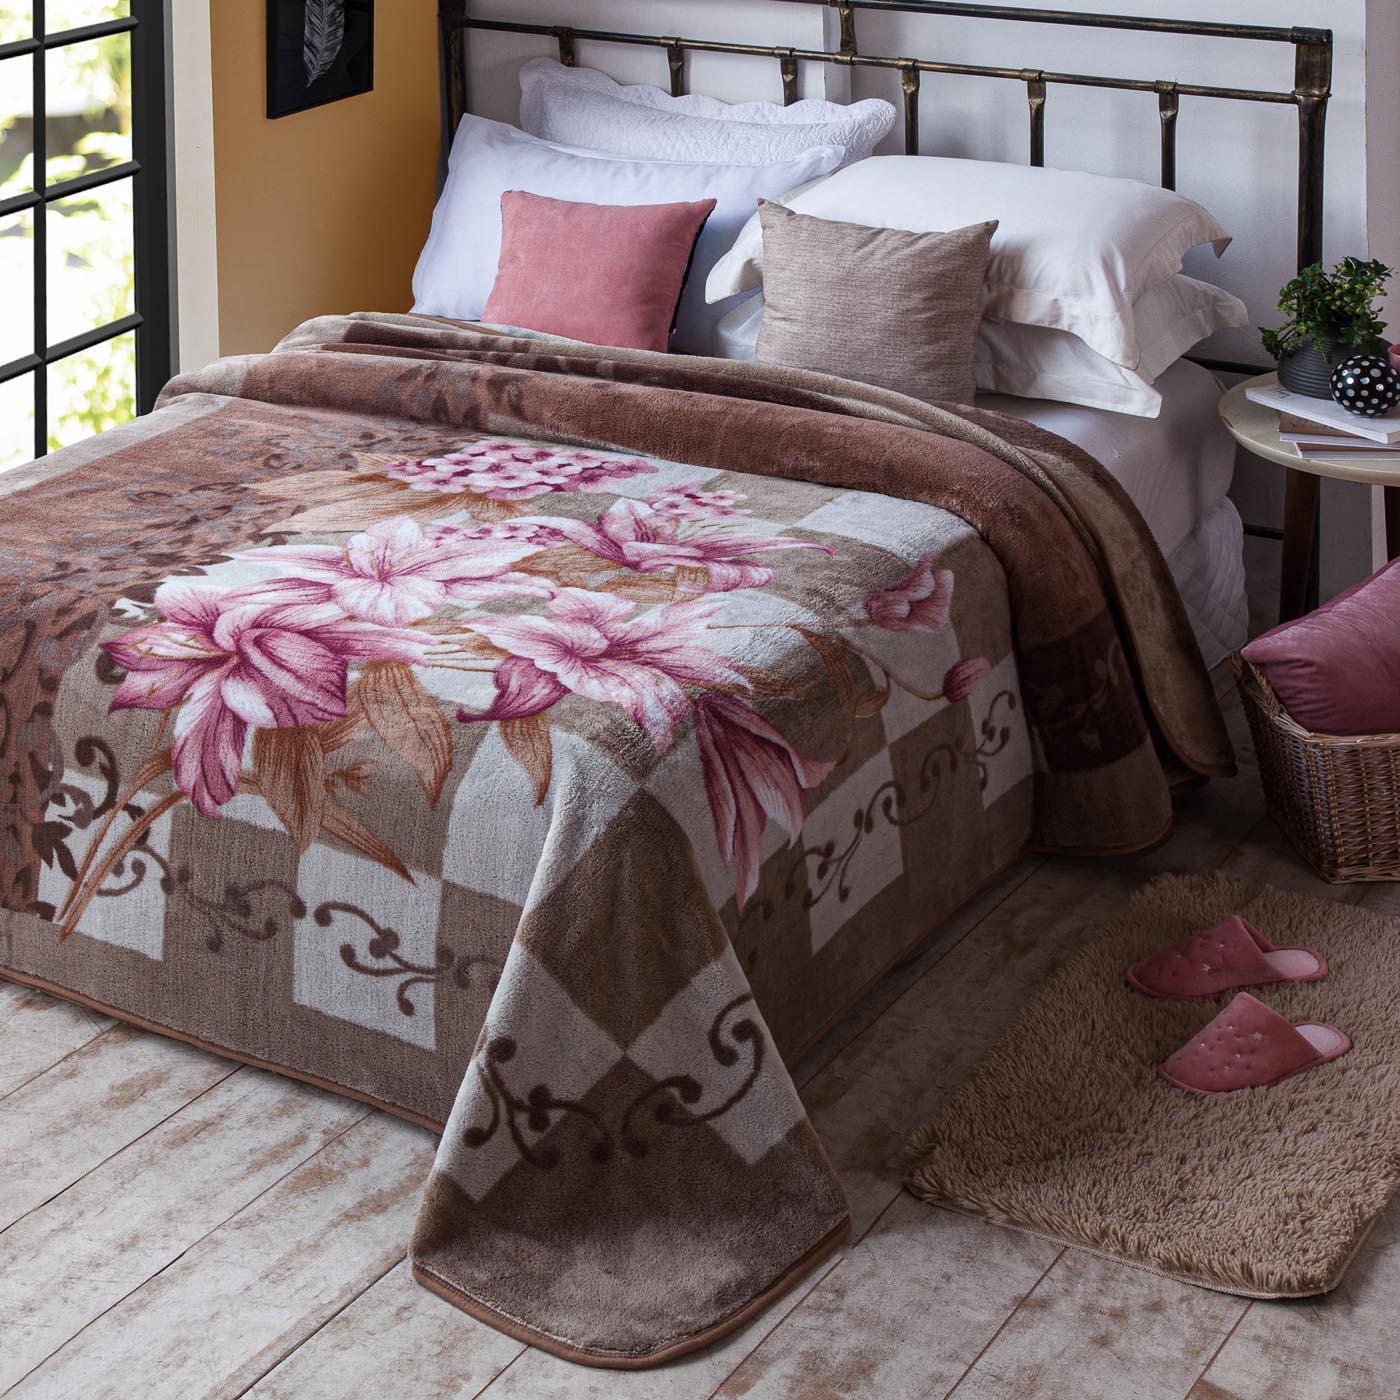 Cobertor Jolitex Antialergico Casal Kyor Plus Mendoza Marrom